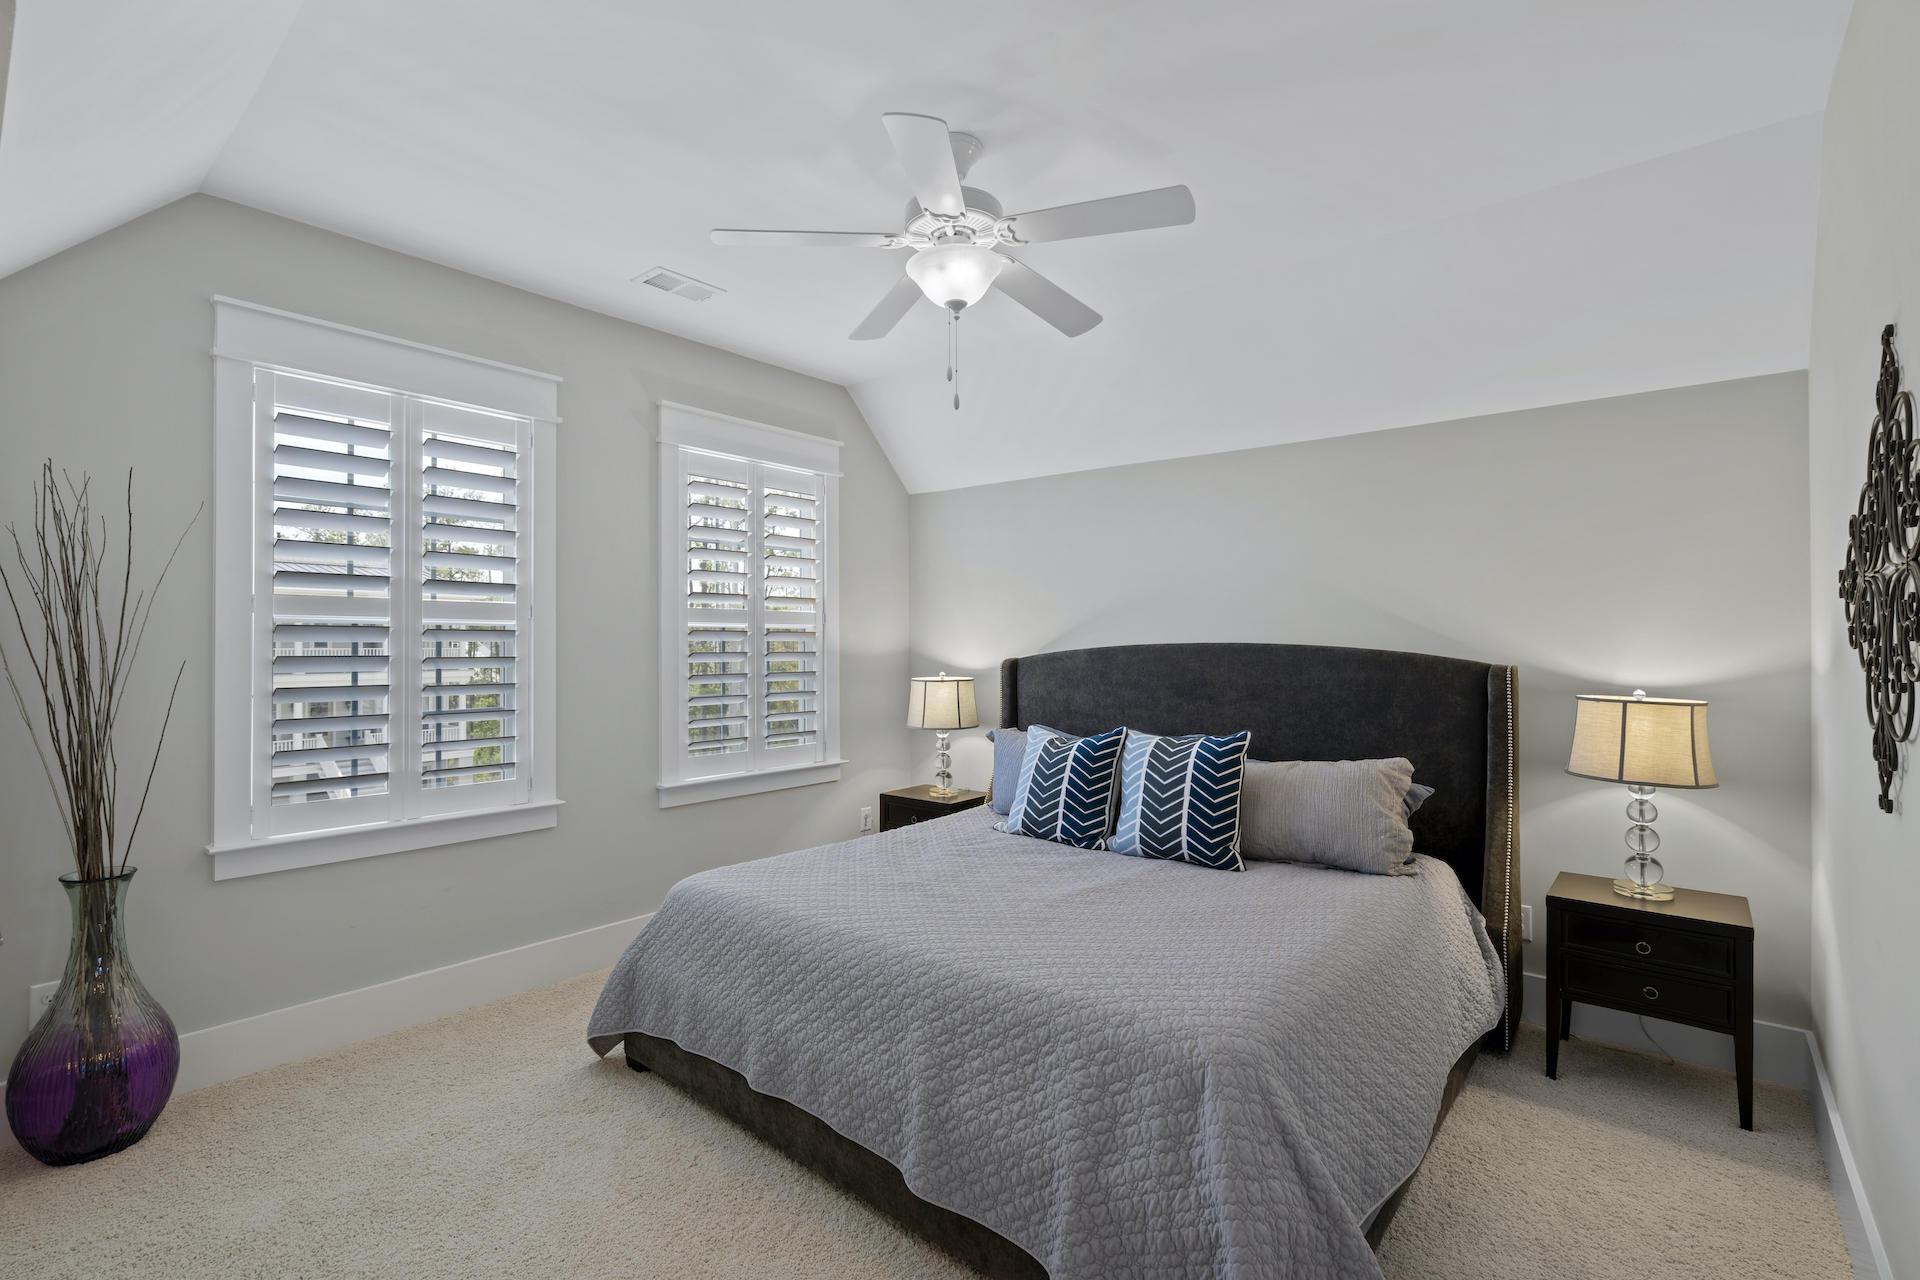 Dunes West Homes For Sale - 2316 Bucktail, Mount Pleasant, SC - 6